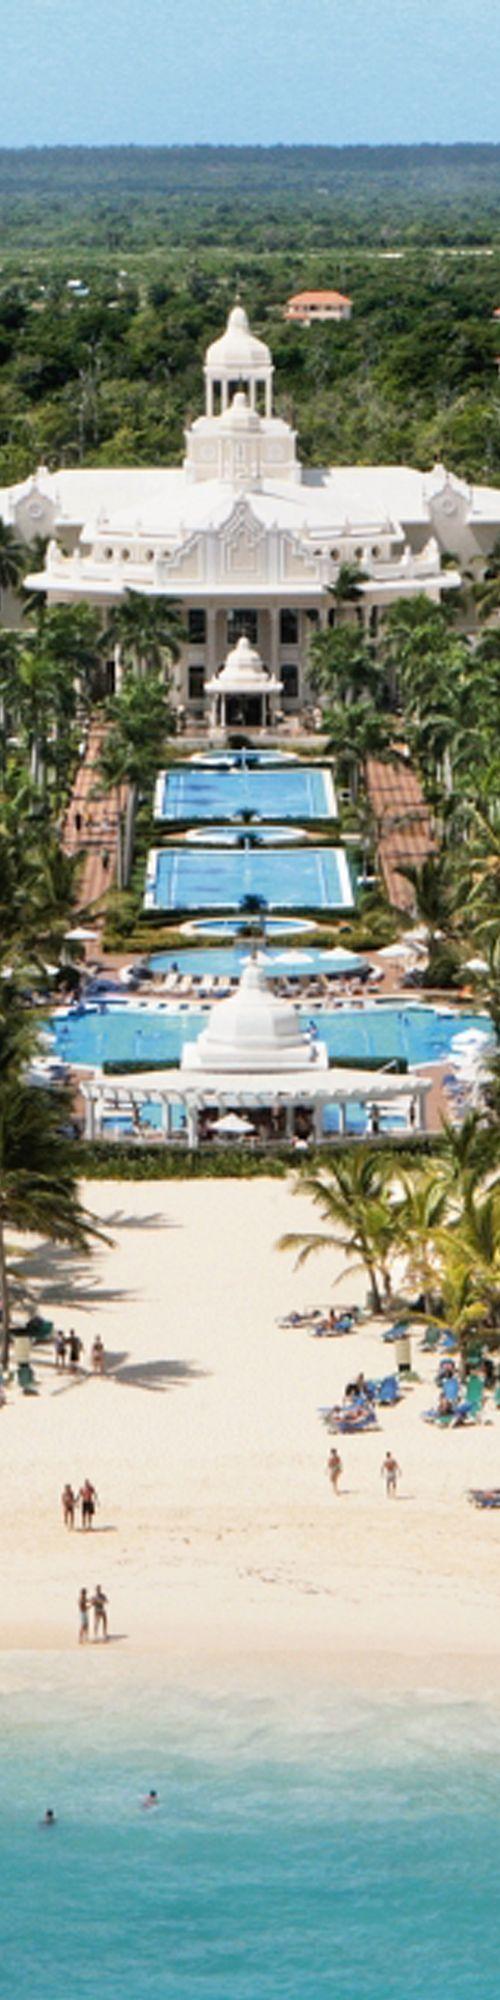 Riu Palace Punta Cana - Dominican Republic - All Inclusive - see front location - fun in the sun